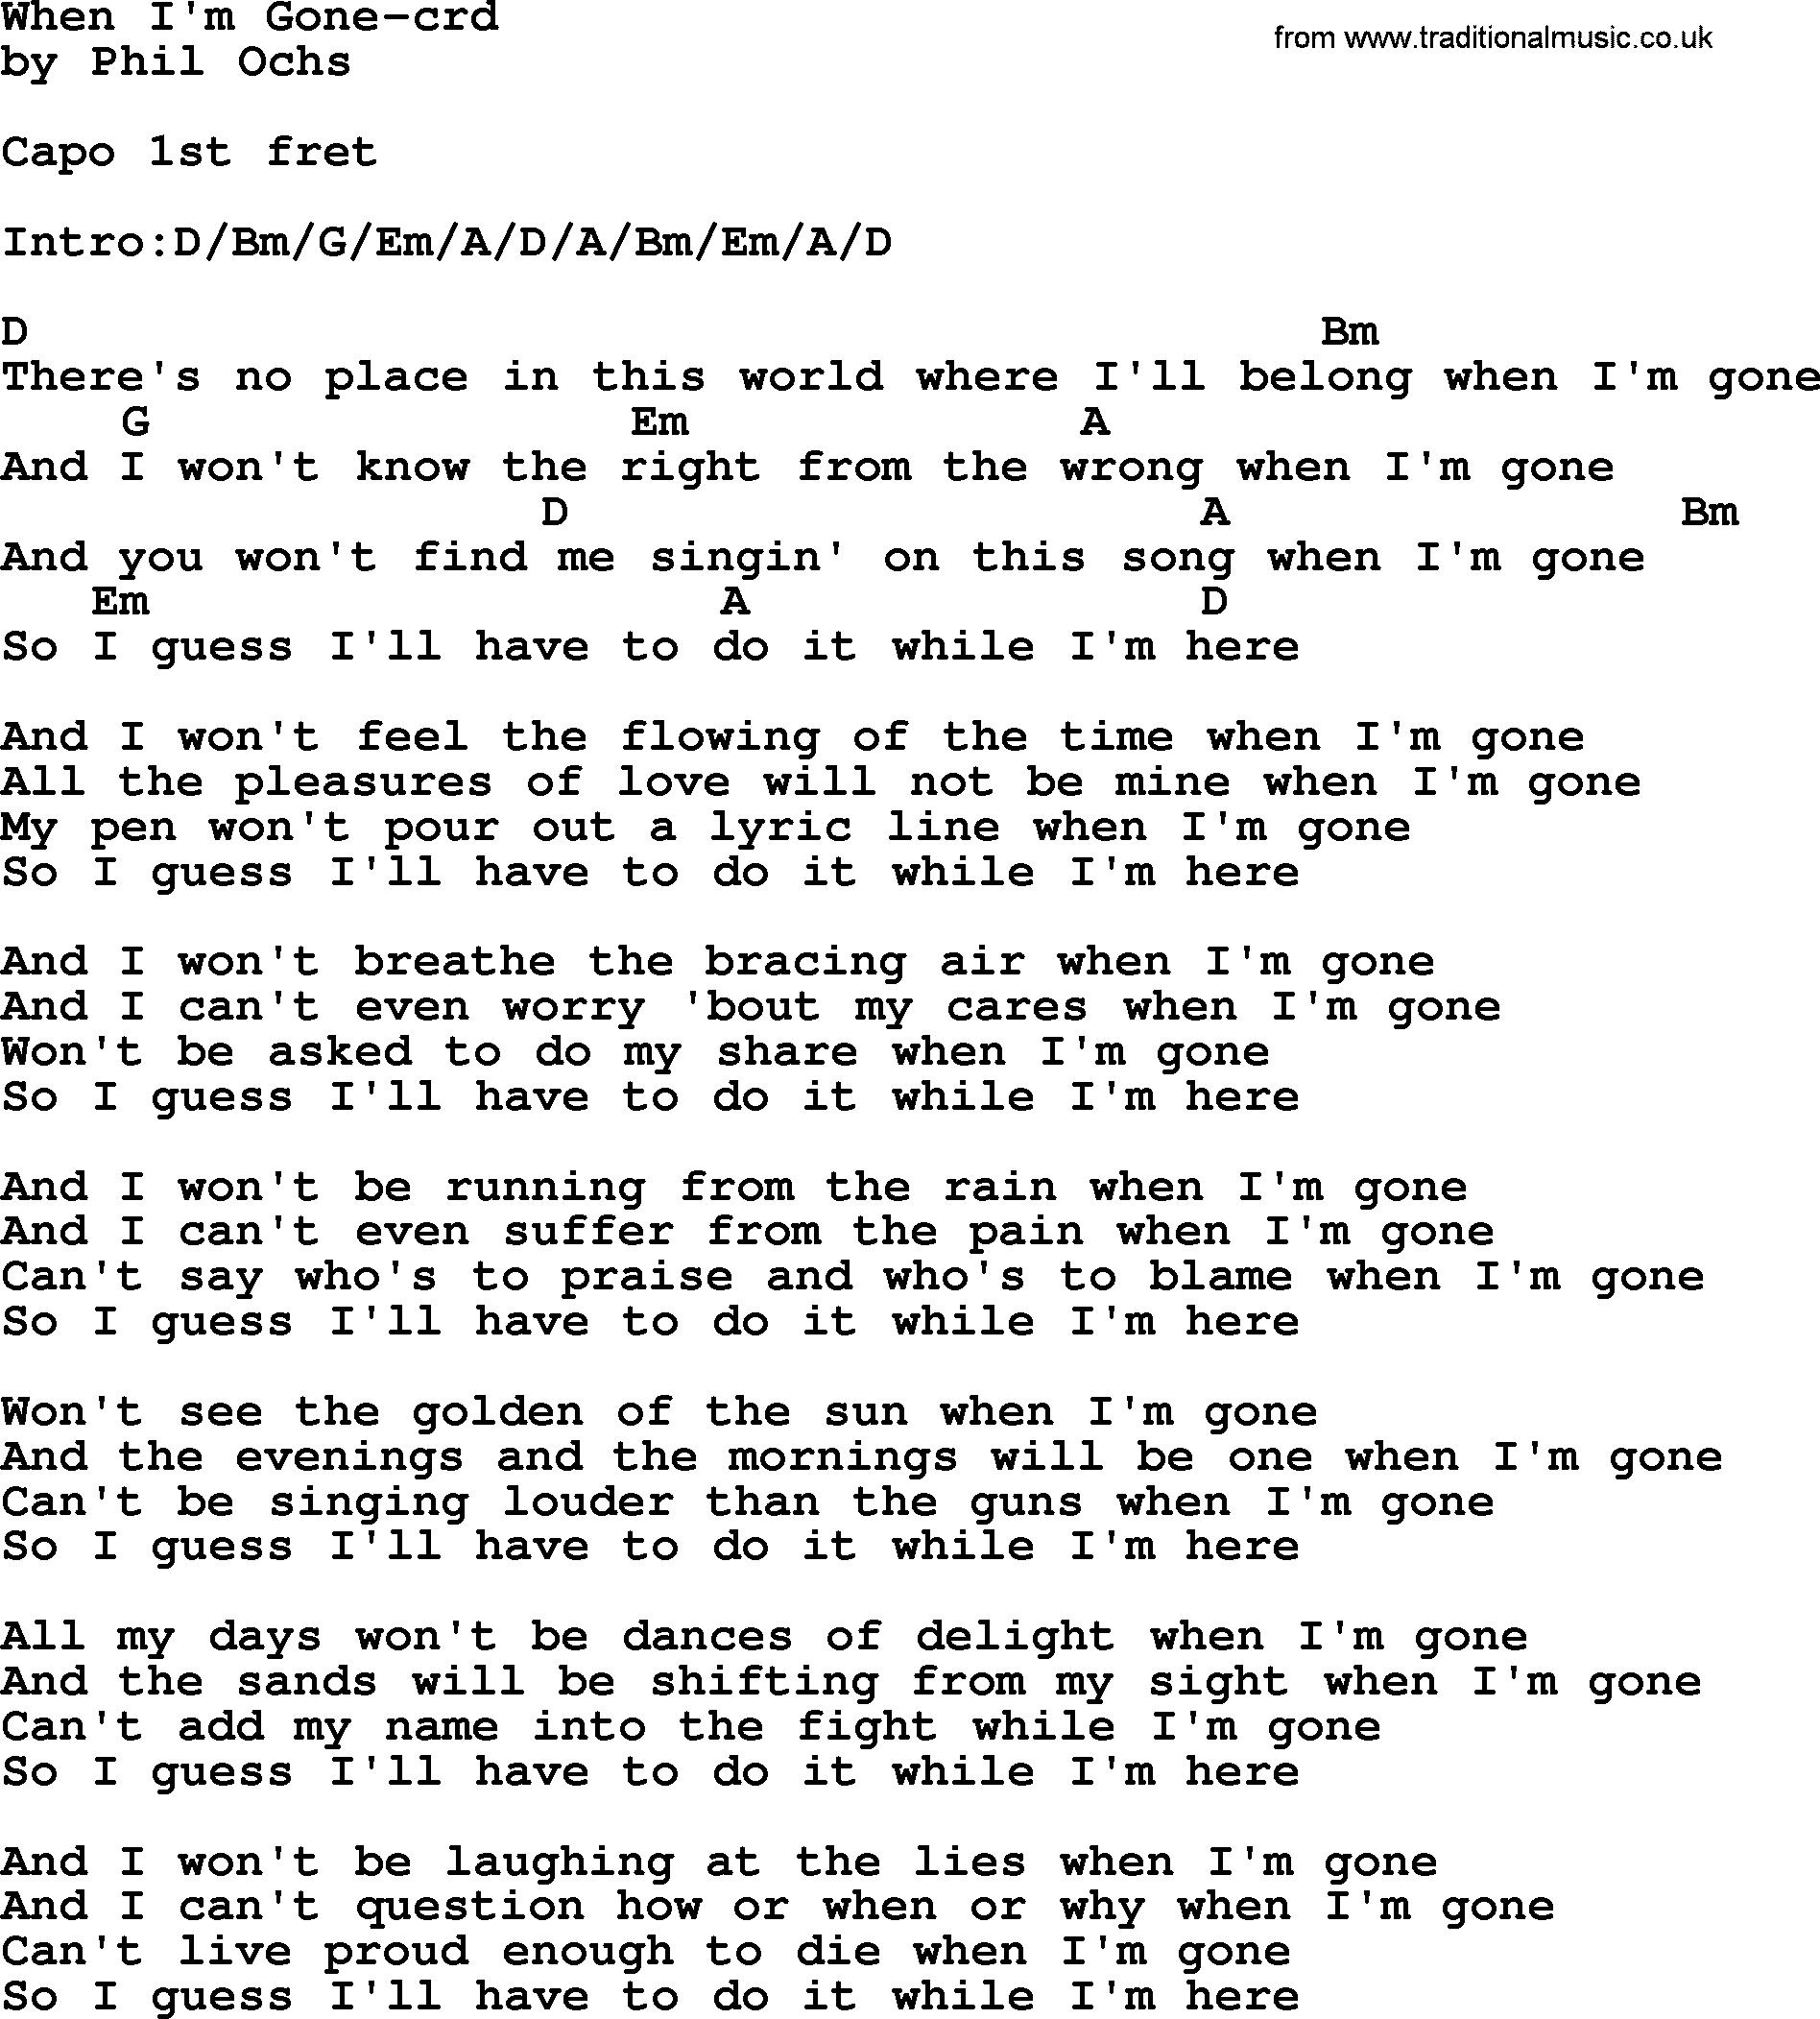 Phil ochs song when im gone by phil ochs lyrics and chords phil ochs song when im gone by phil ochs lyrics and chords hexwebz Gallery